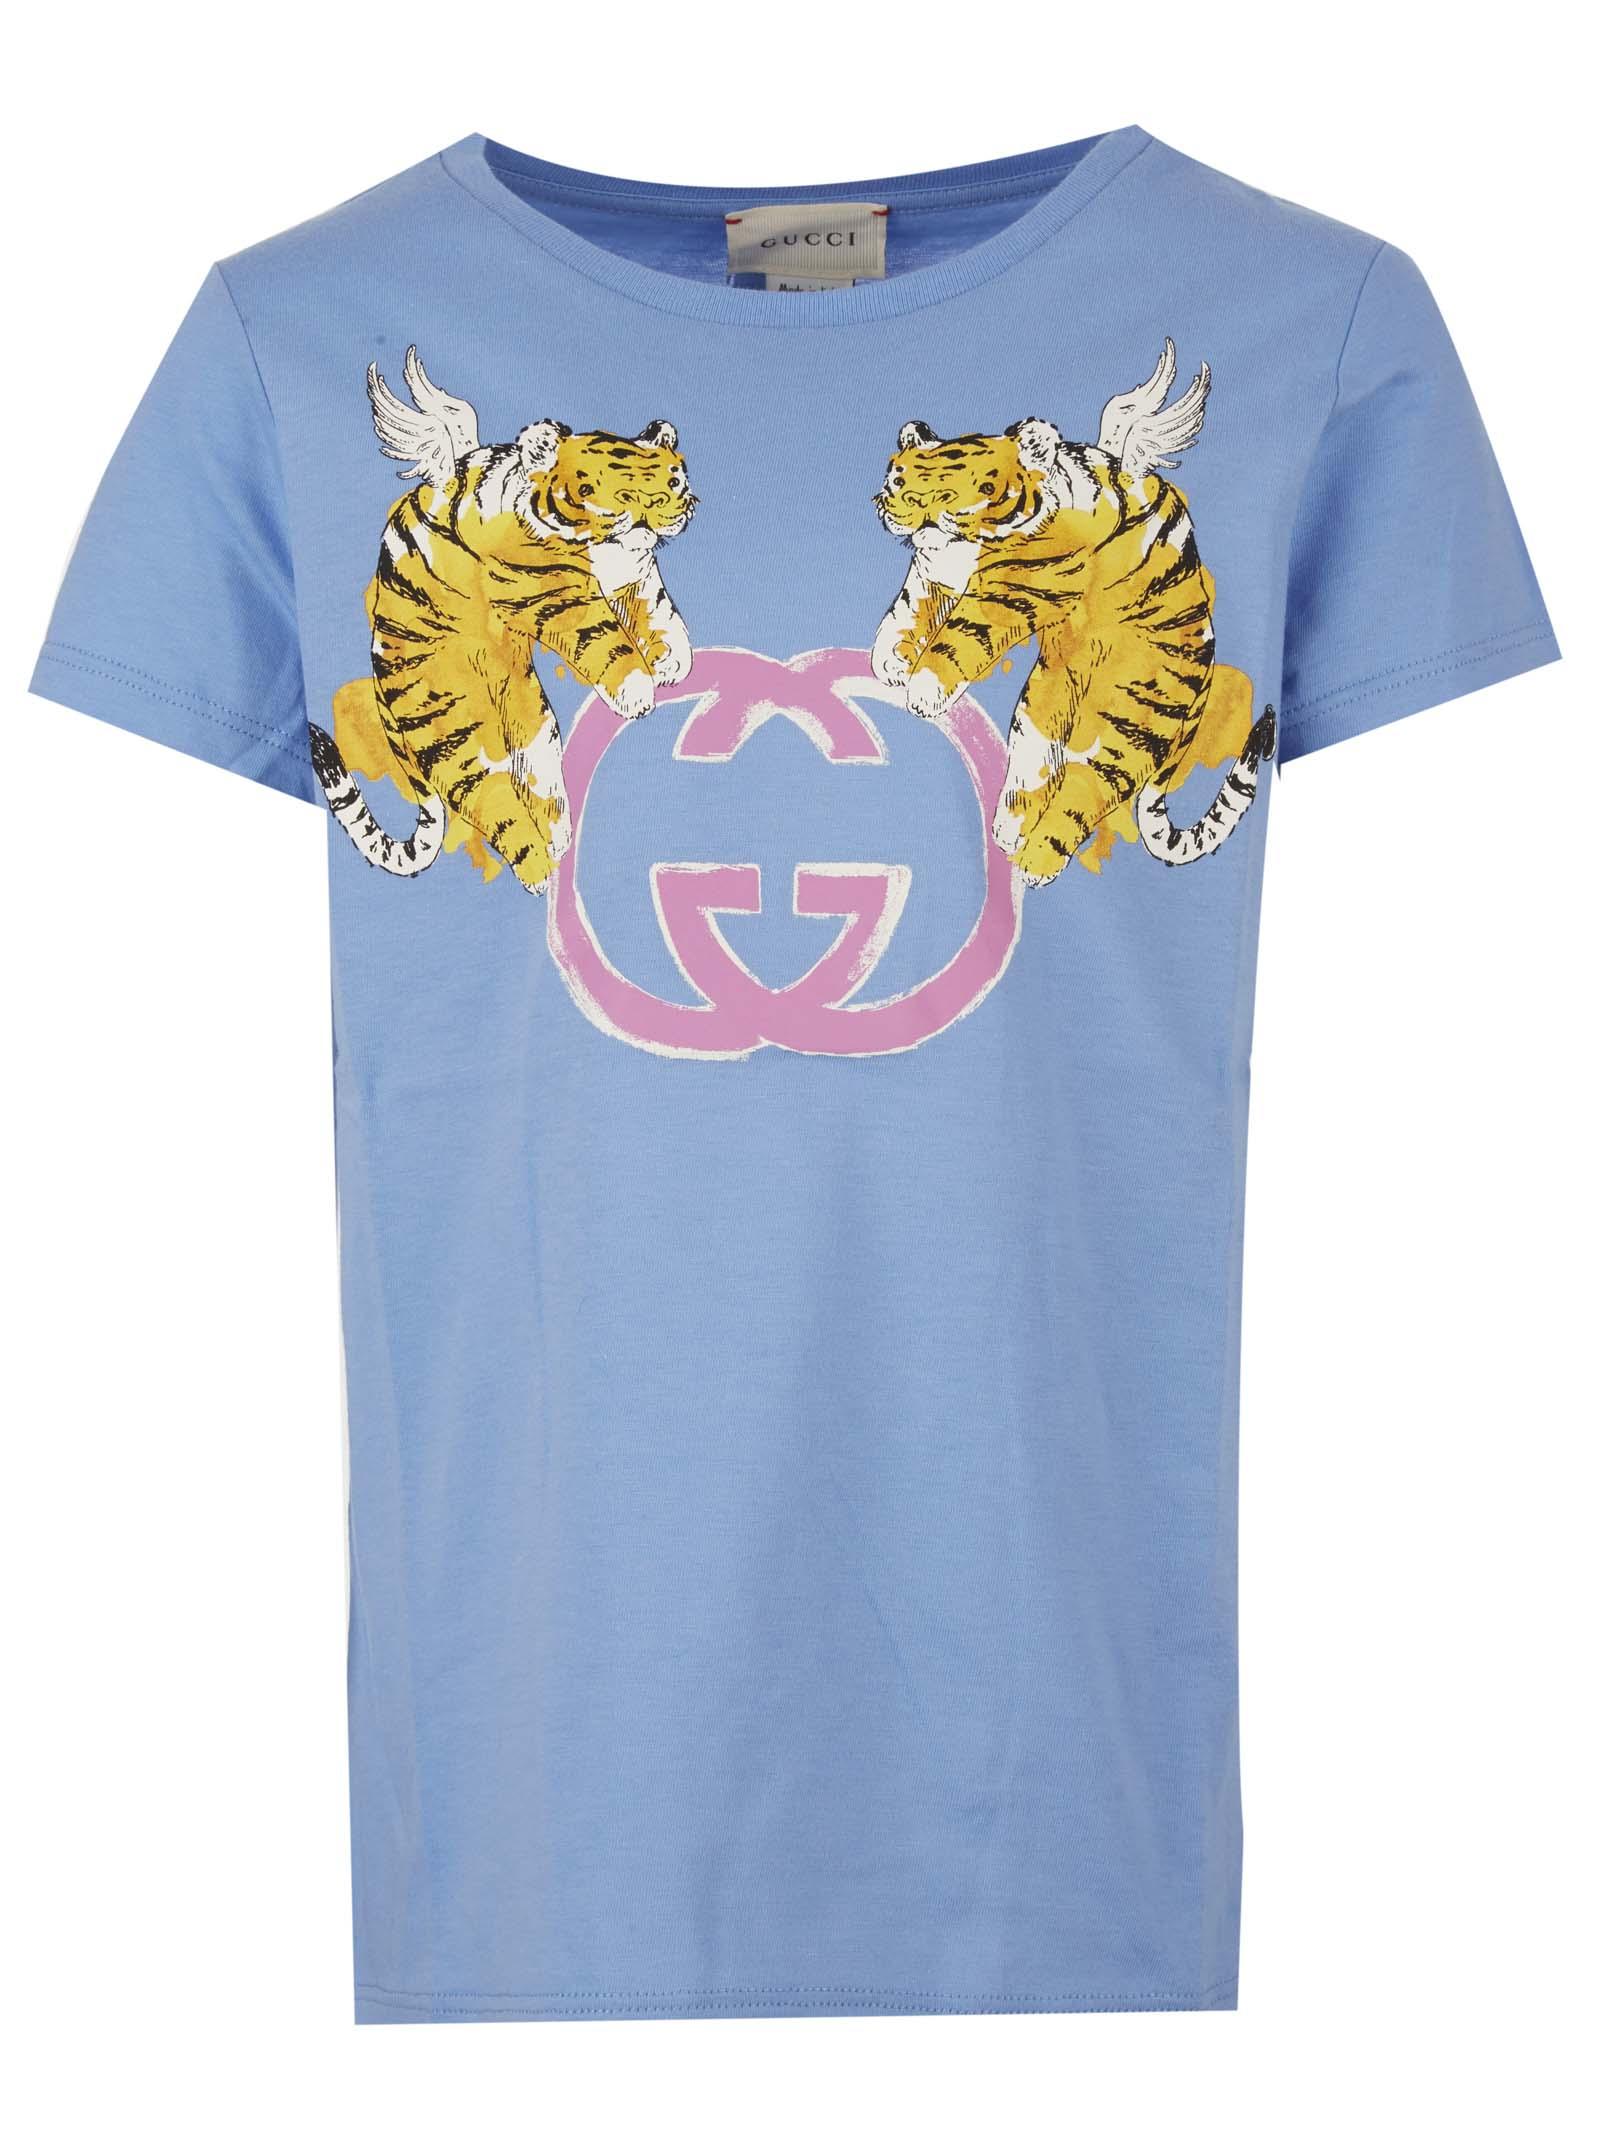 31191efd Gucci Junior t-shirt - Gucci Junior - Michele Franzese Moda